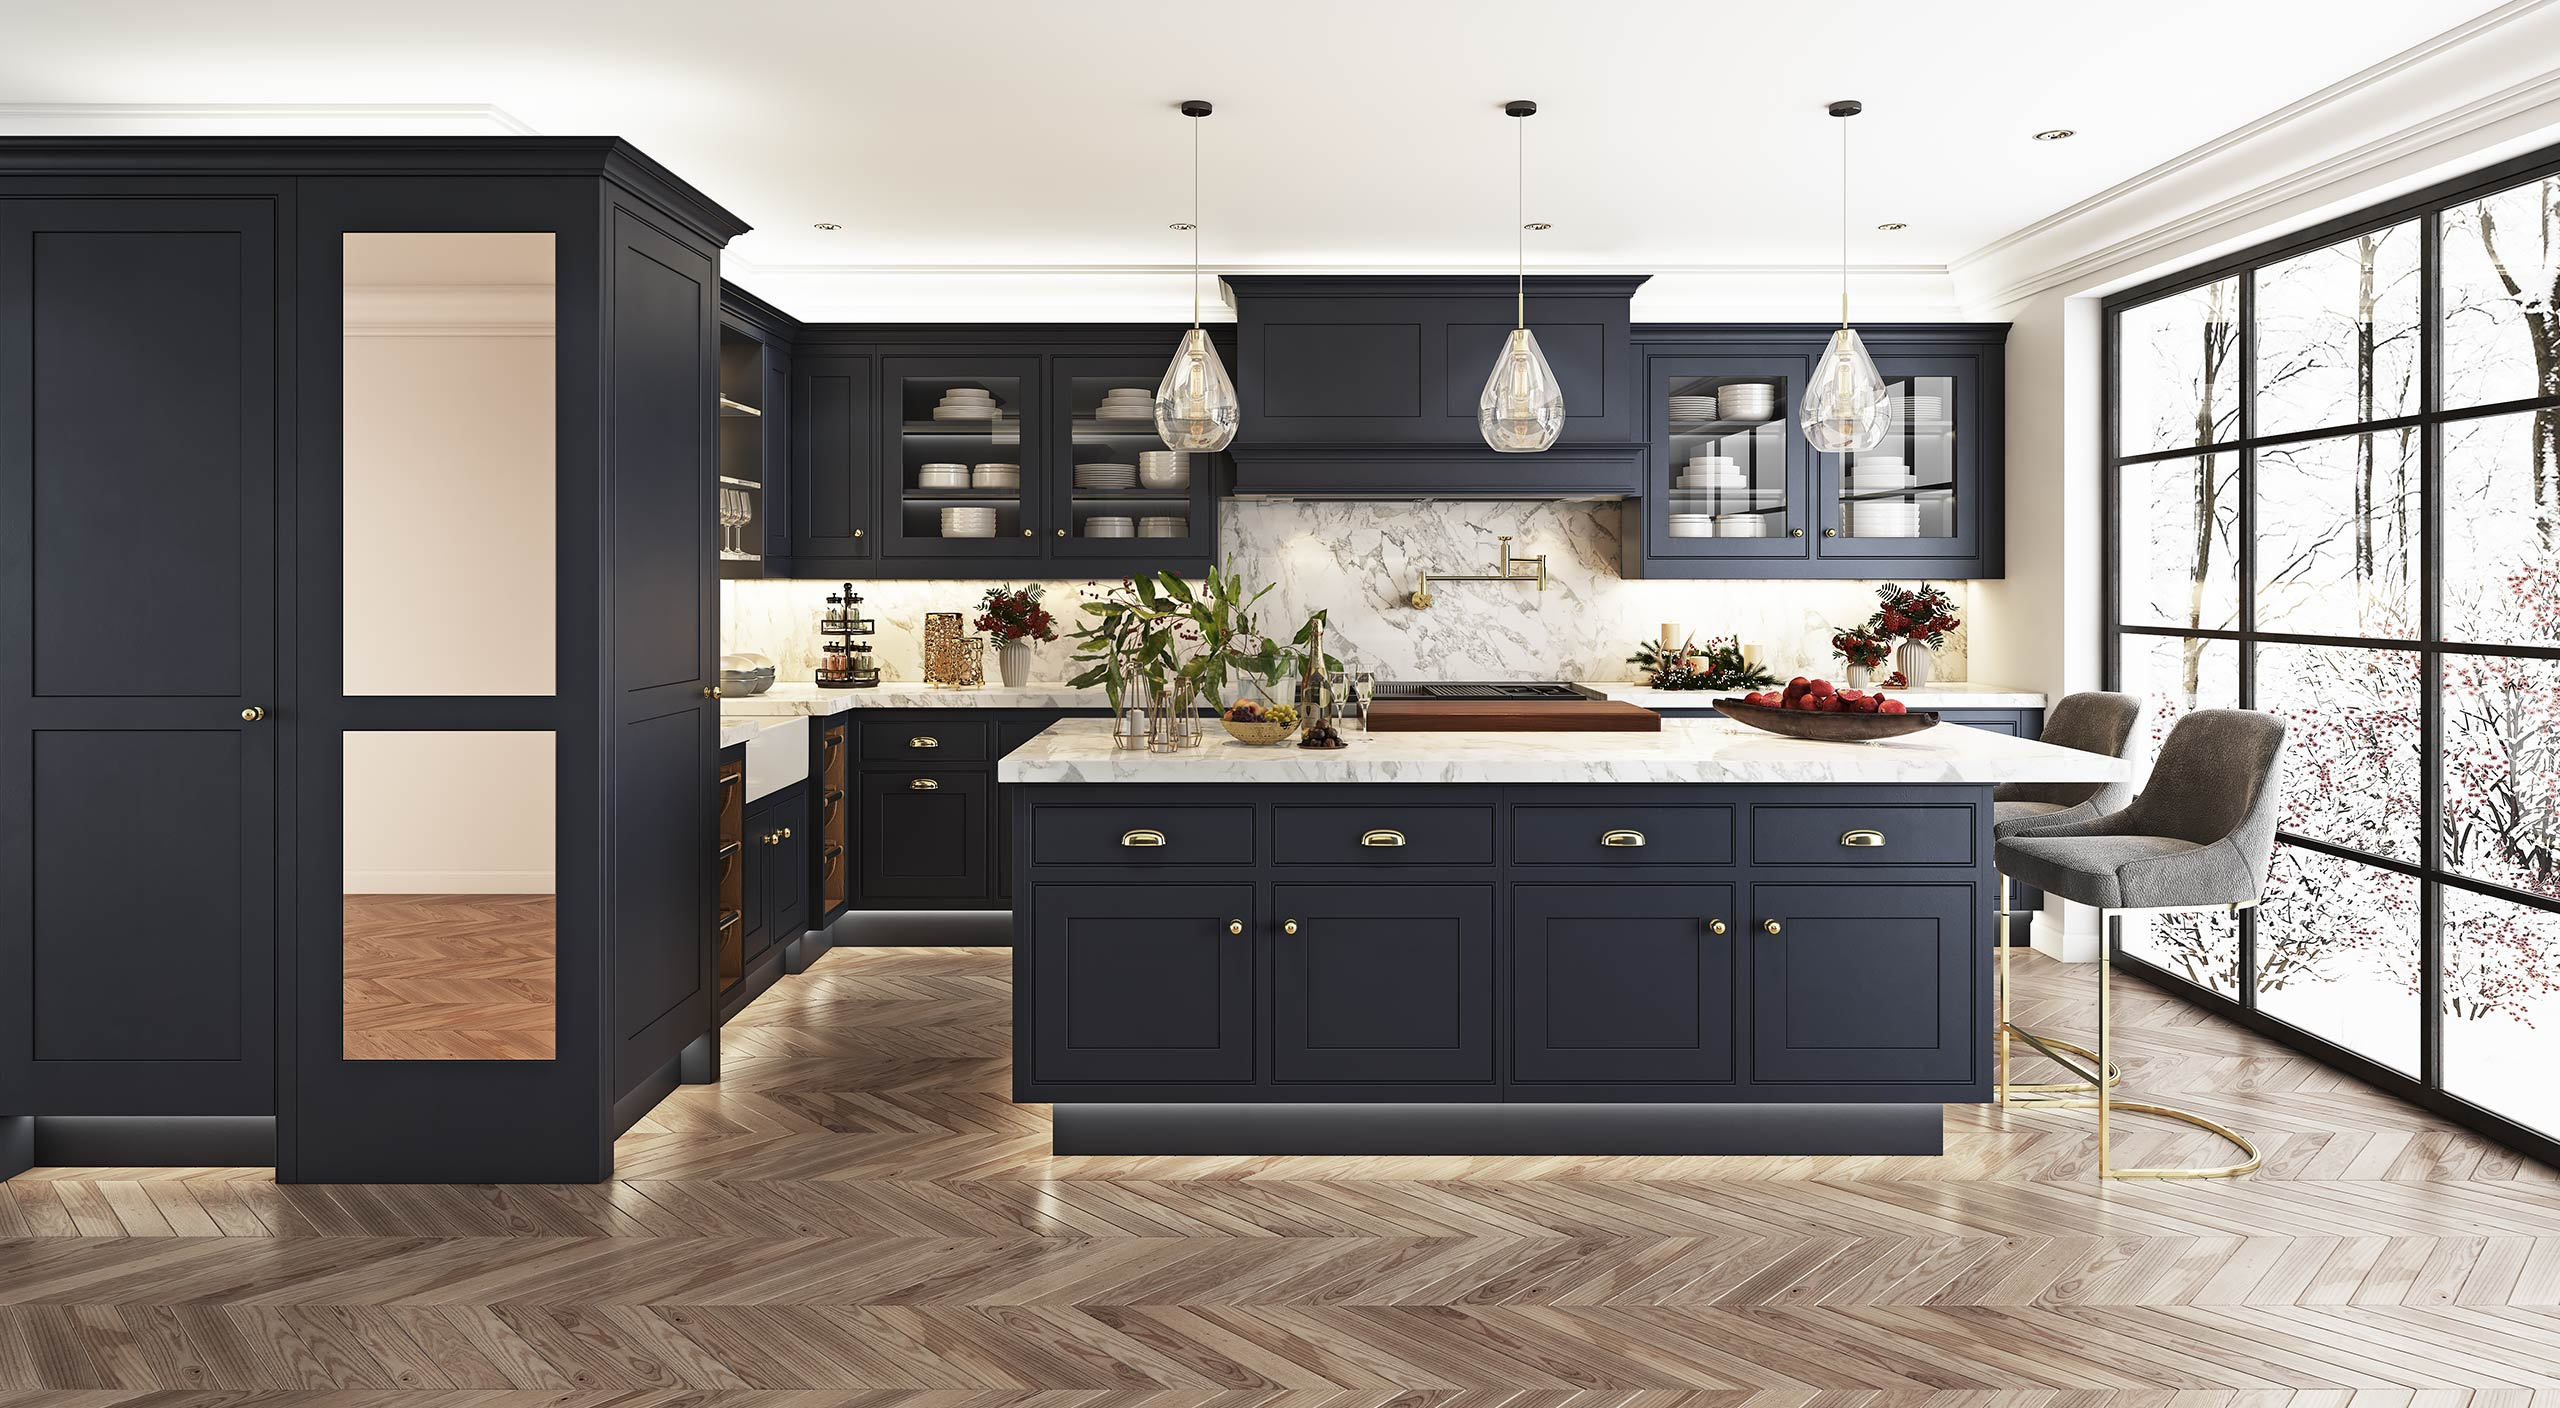 The Smallbone Iconic original hand painted kitchen in dark blue